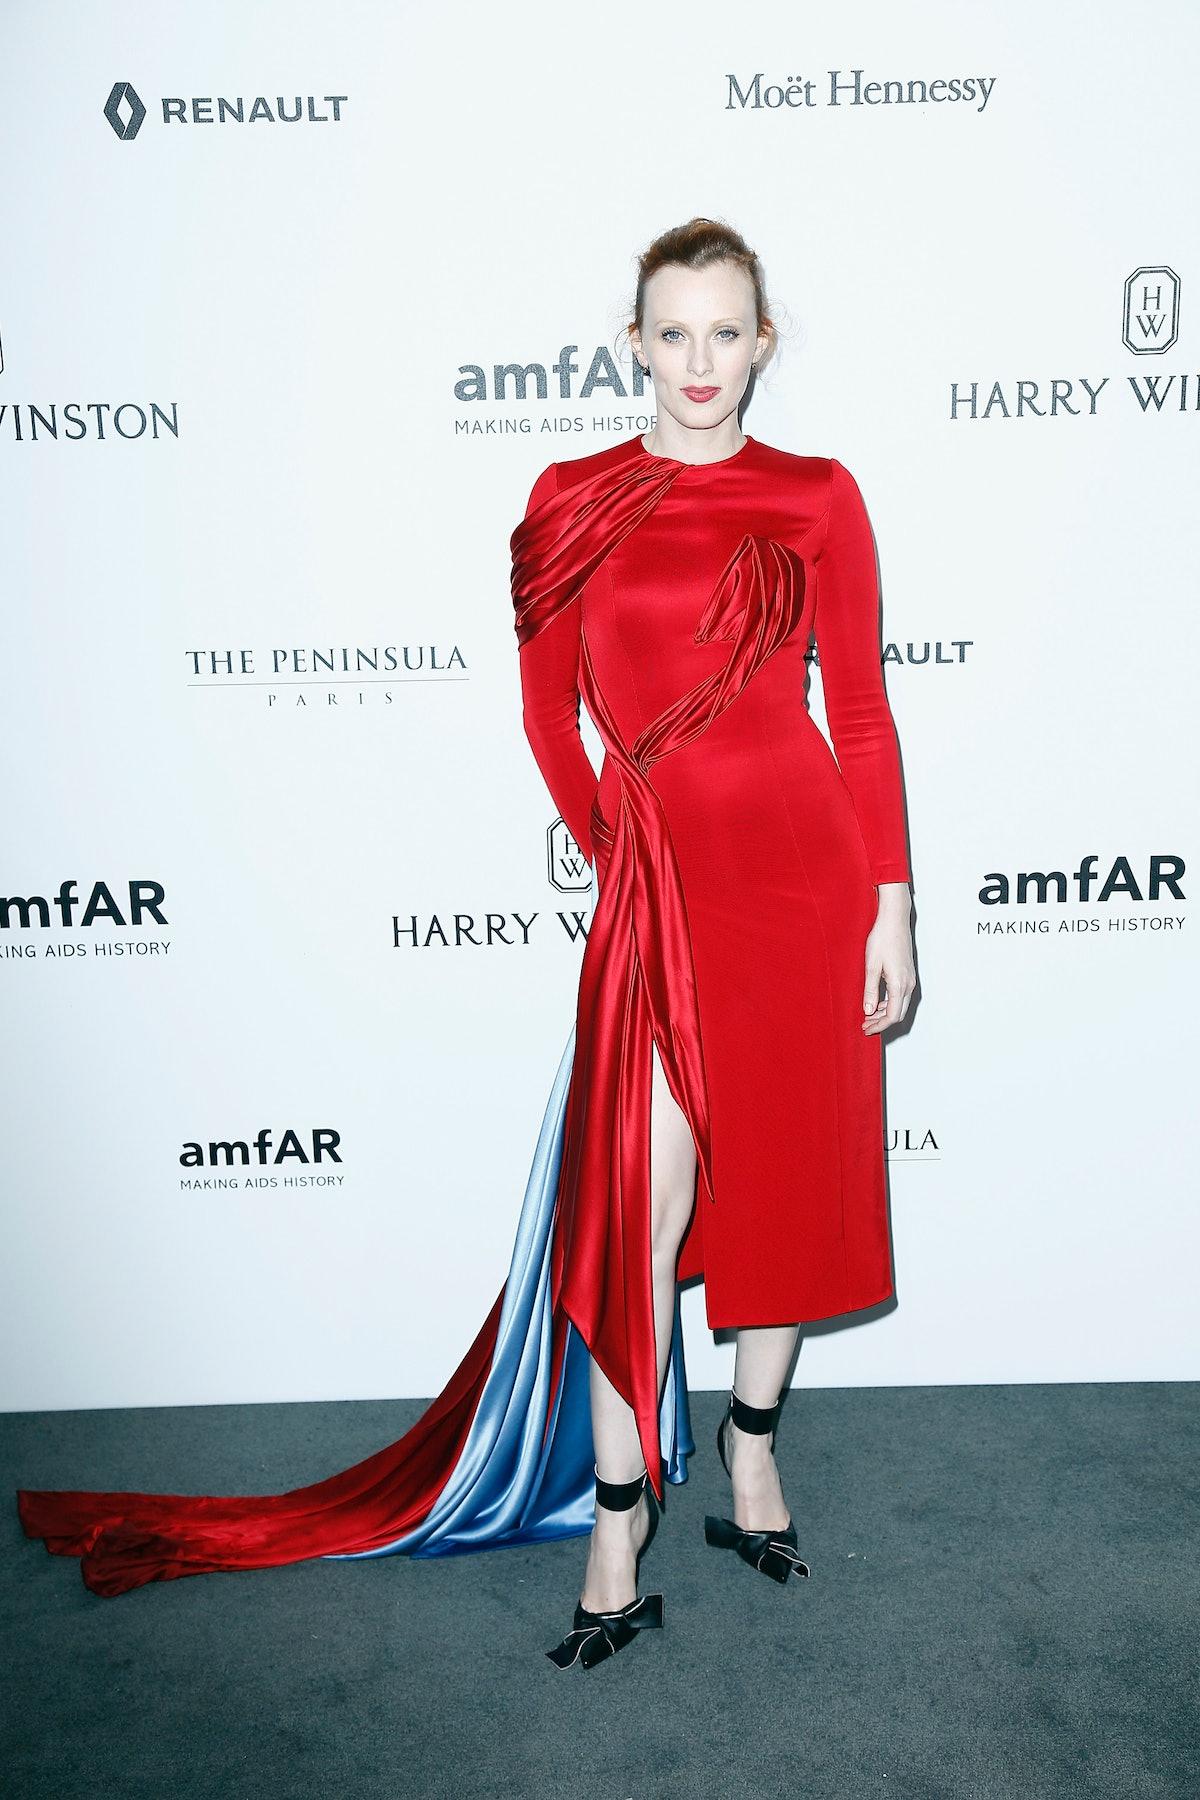 Amfar Paris Dinner - Stars Gather For Amfar During The Haute Couture Week - Red Carpet